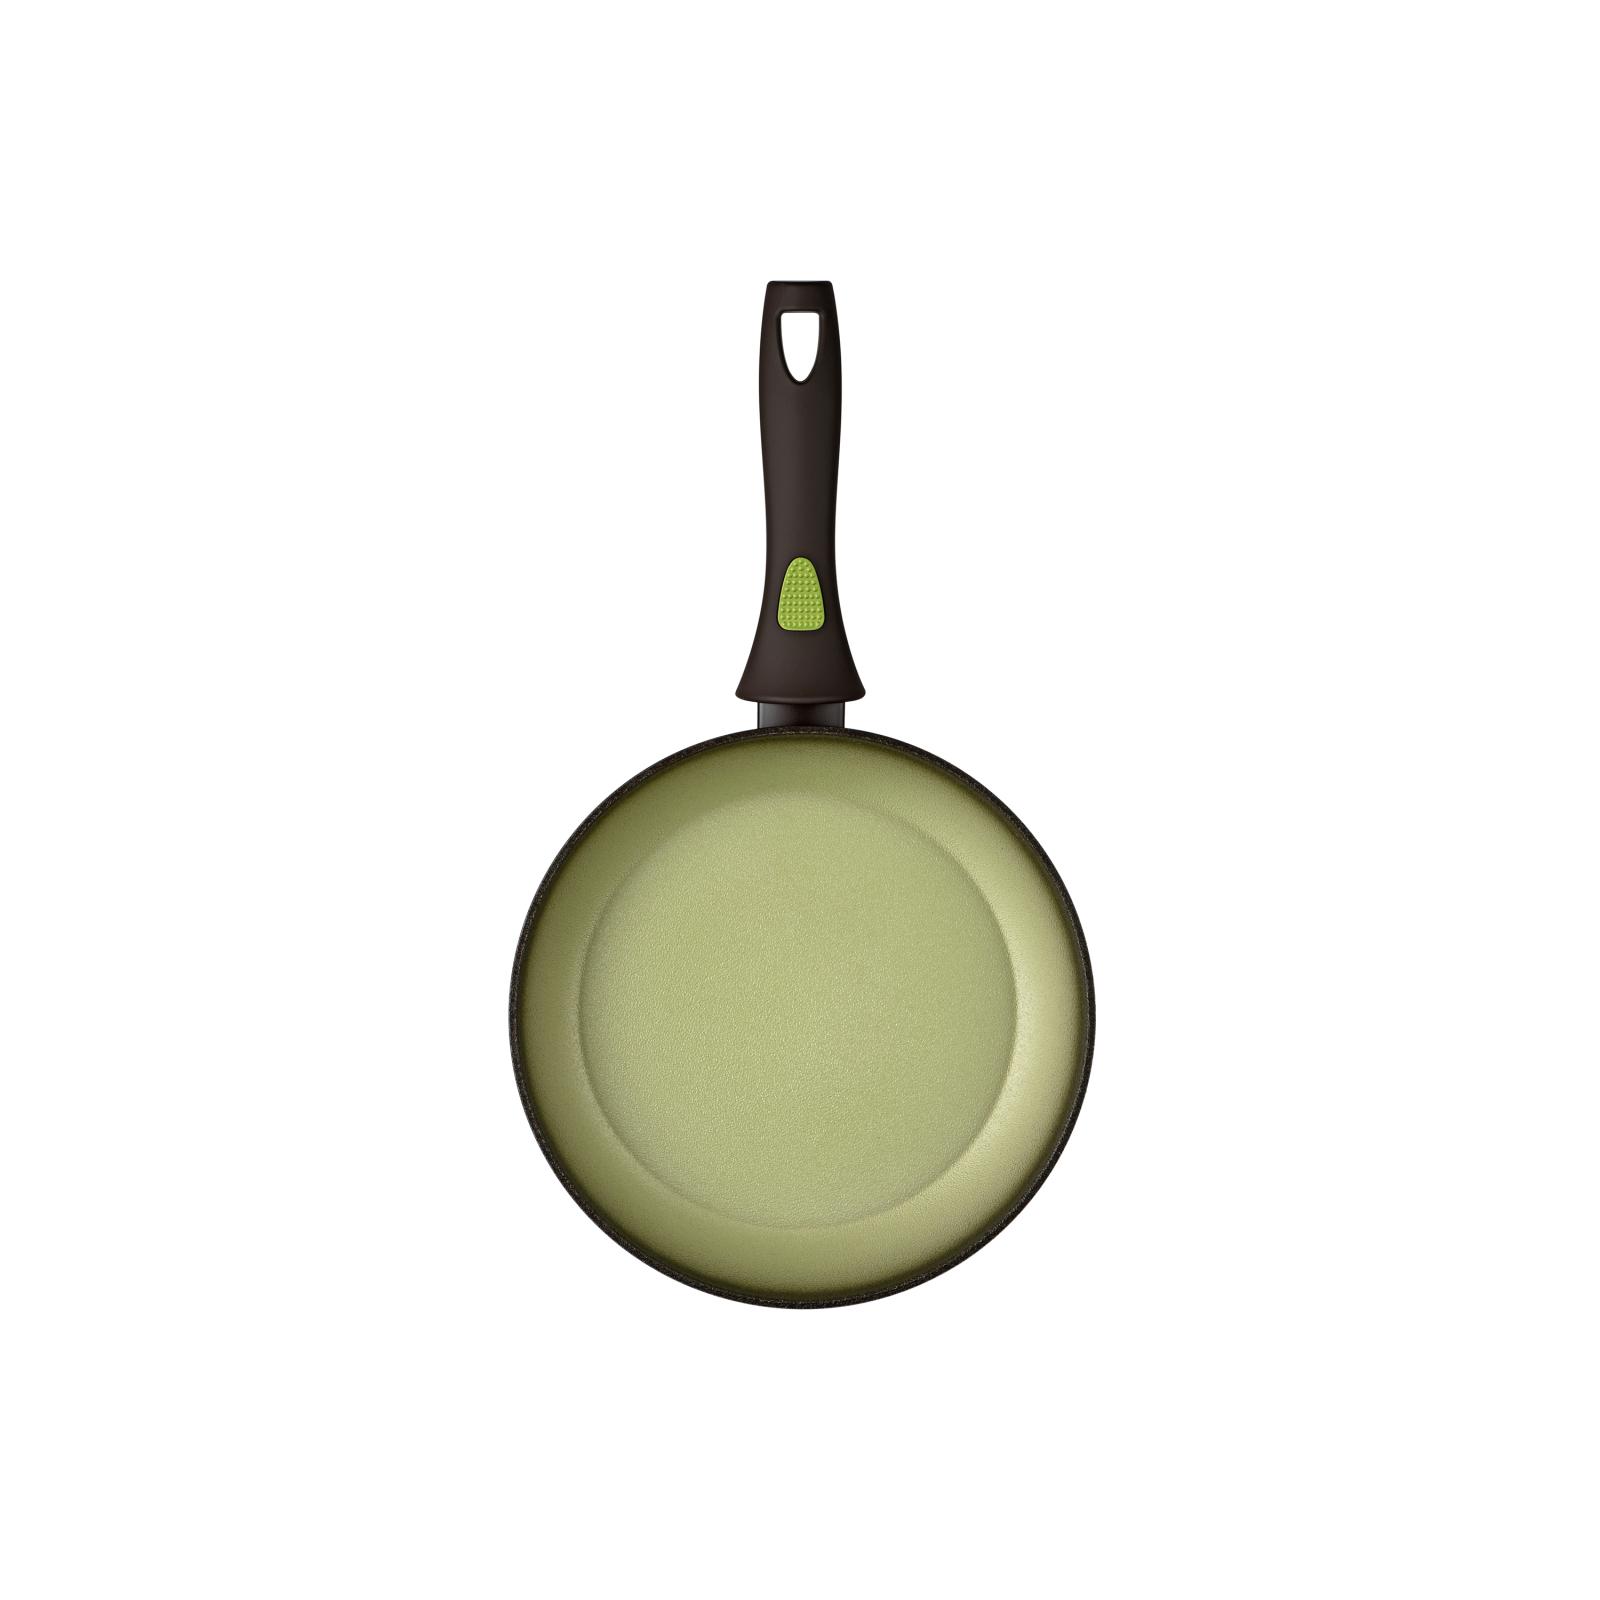 Сковорода Ardesto Avocado 24 см (AR2524FA) зображення 2